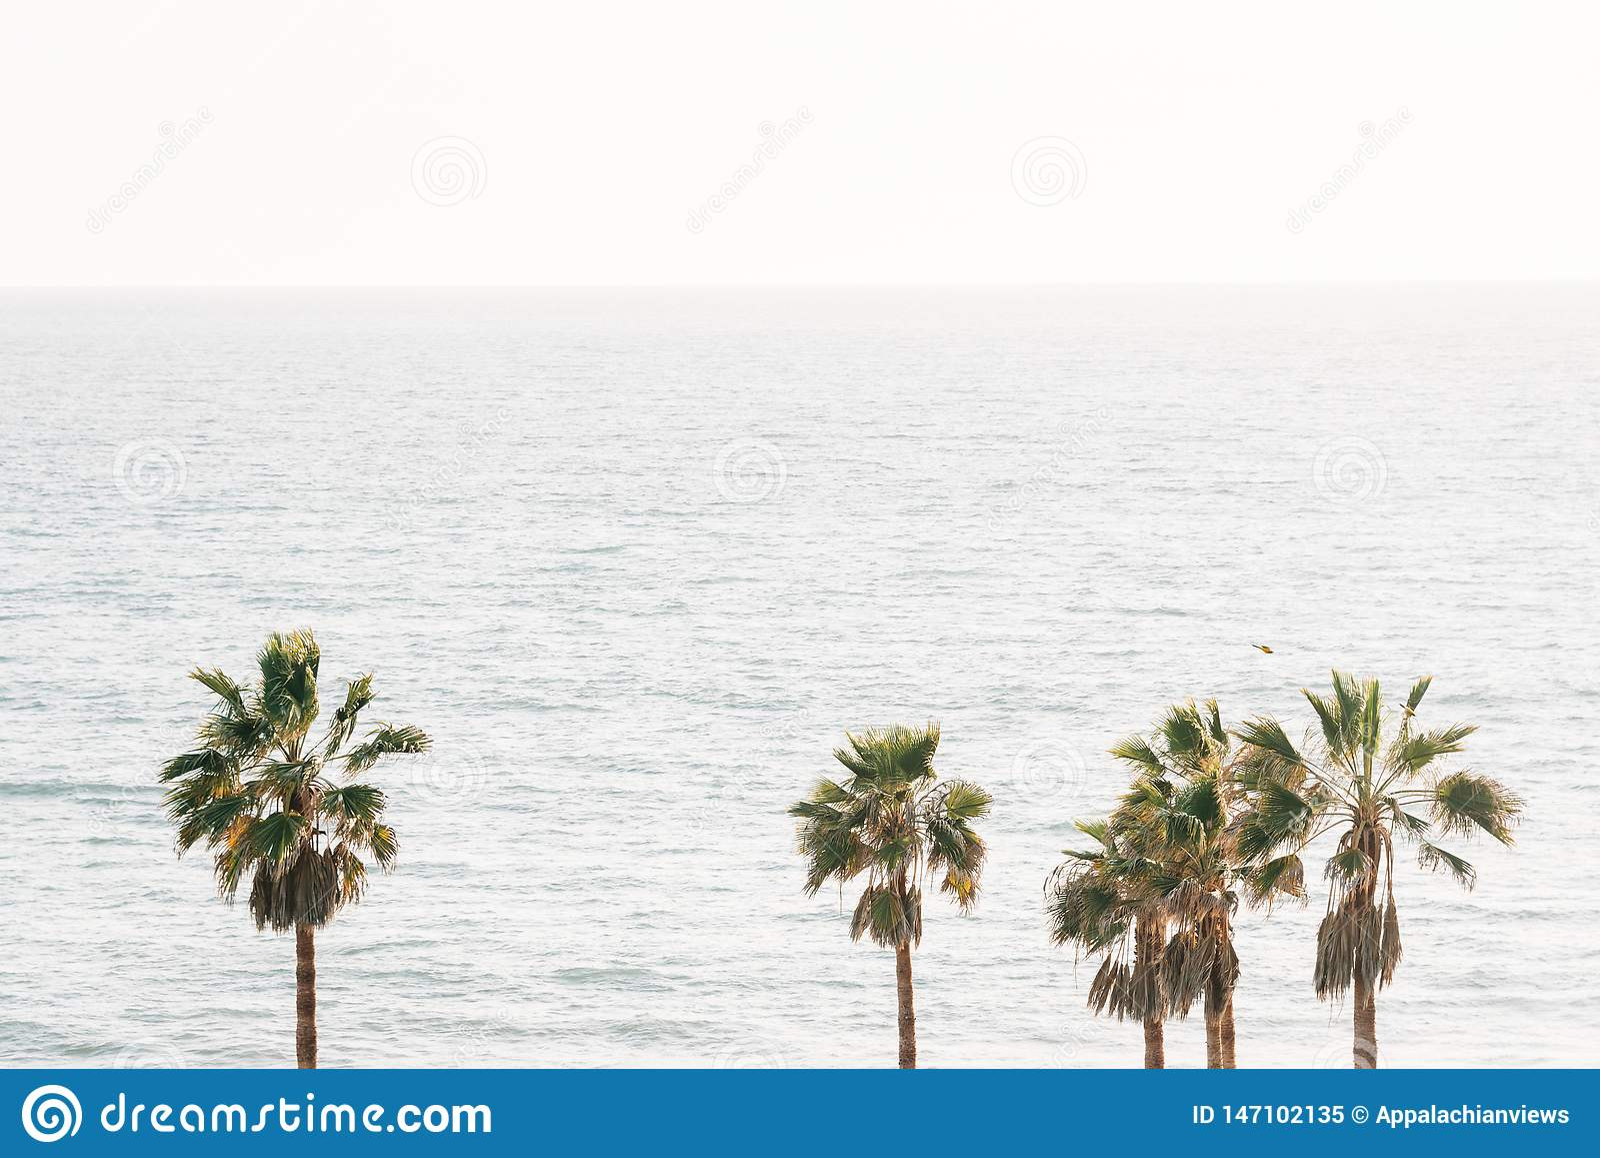 Drzewka palmowe i ocean spokojny w San Clemente, orange county, Kalifornia